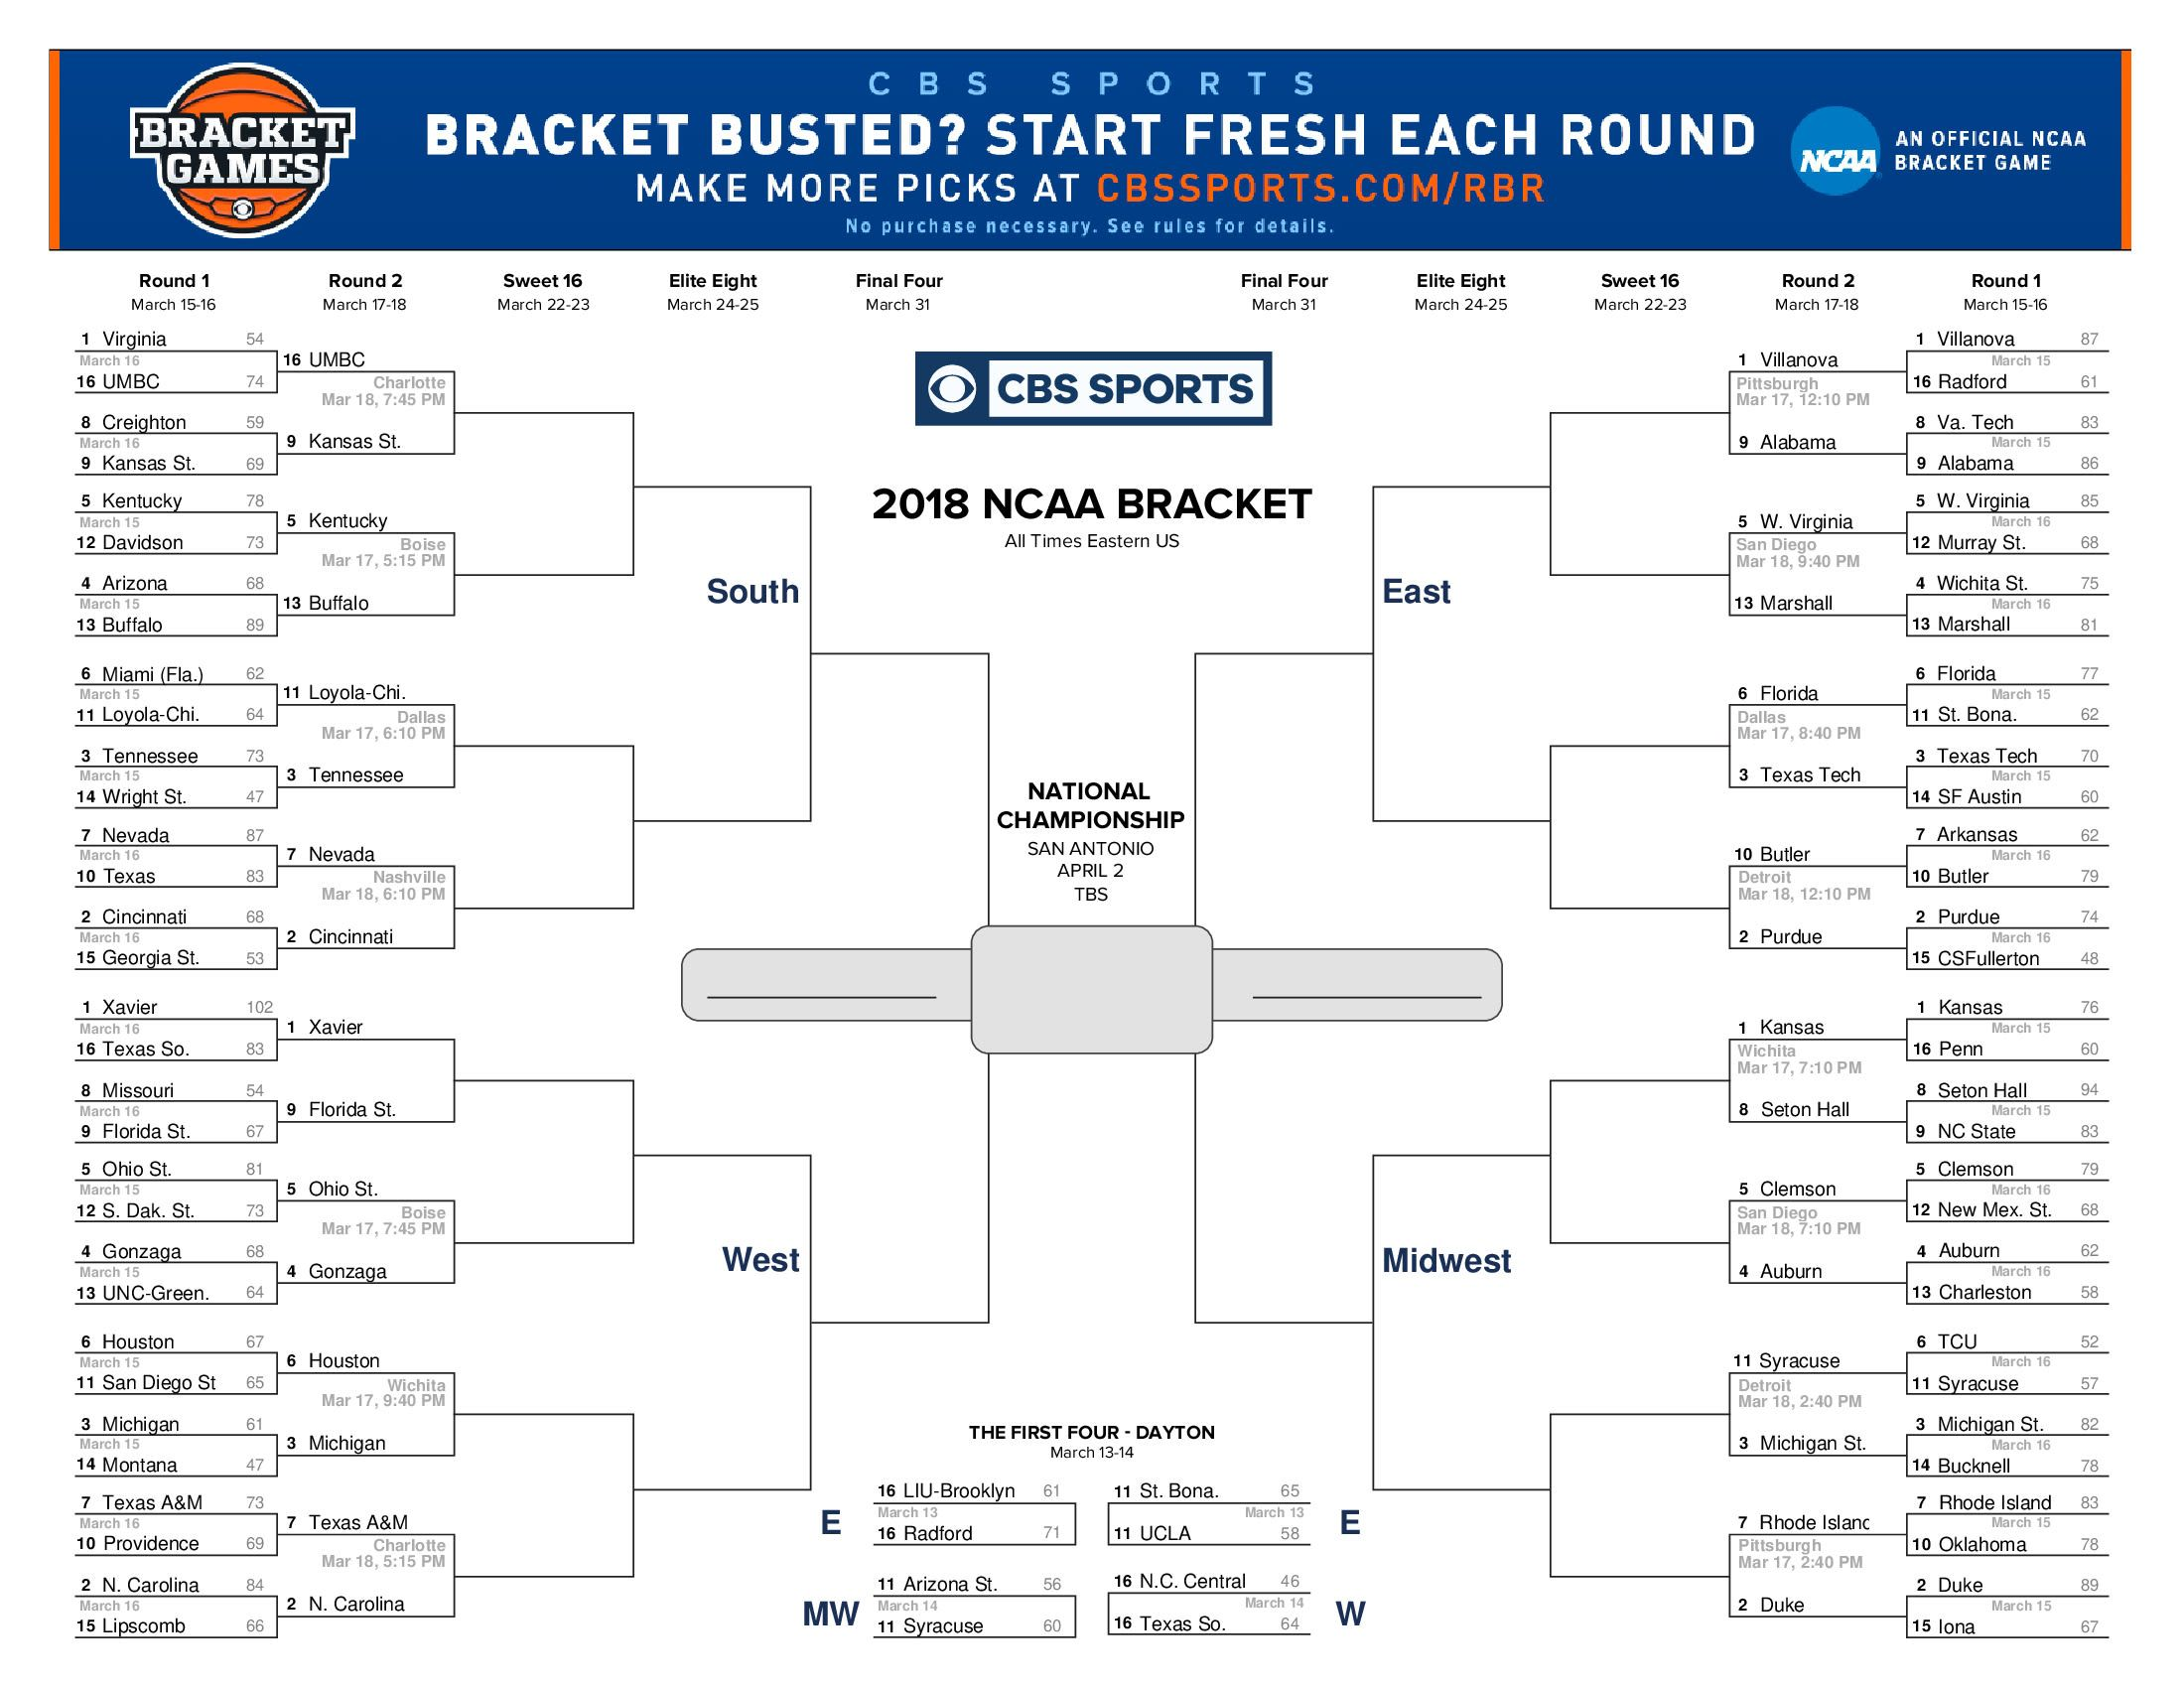 2018 NCAA Tournament Schedule, TV channels, watch online